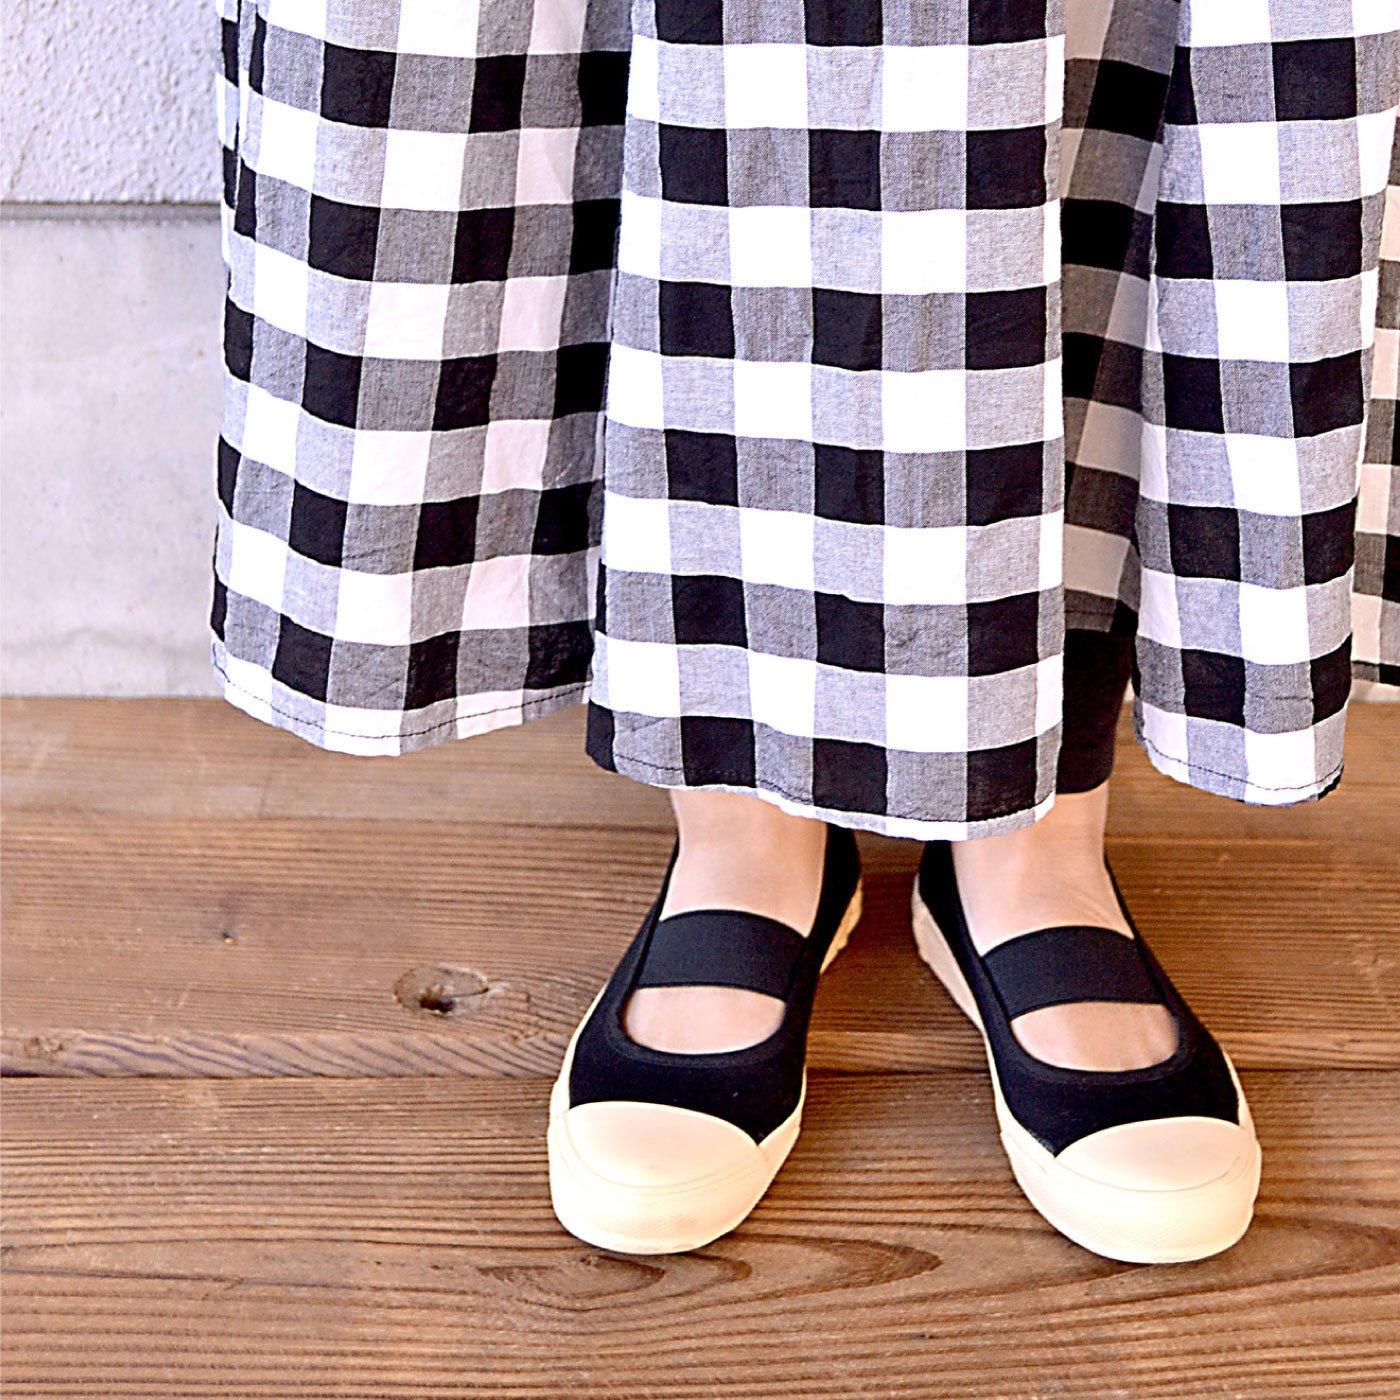 PENNY LANE〔ペニーレイン〕 きゅんと懐かしい大人の上靴